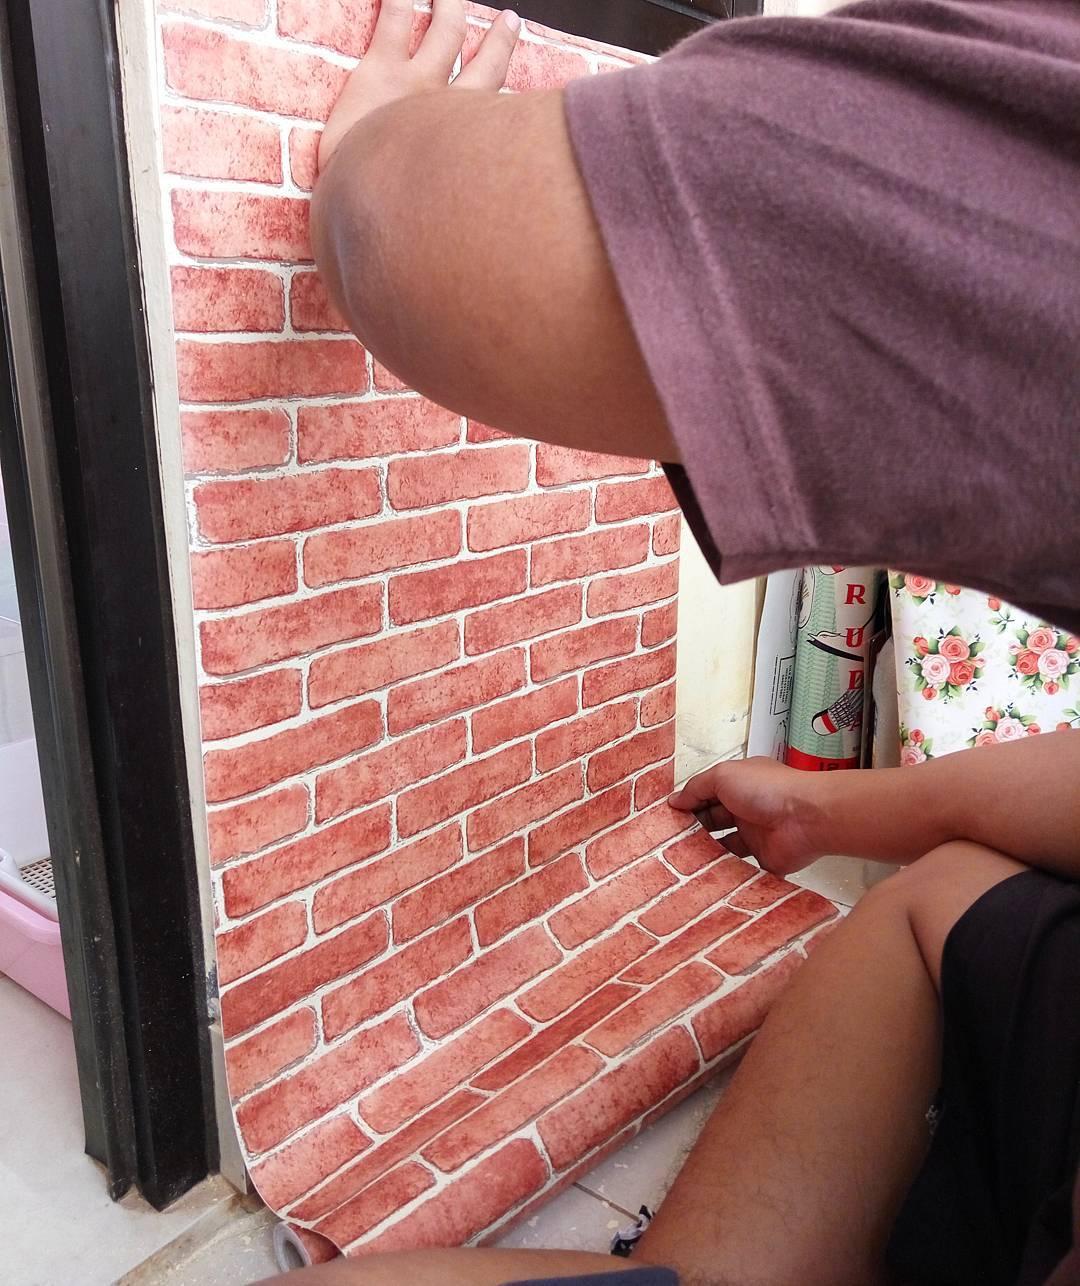 ide dan cara membuat hiasan dinding kamar buatan sendiri dengan